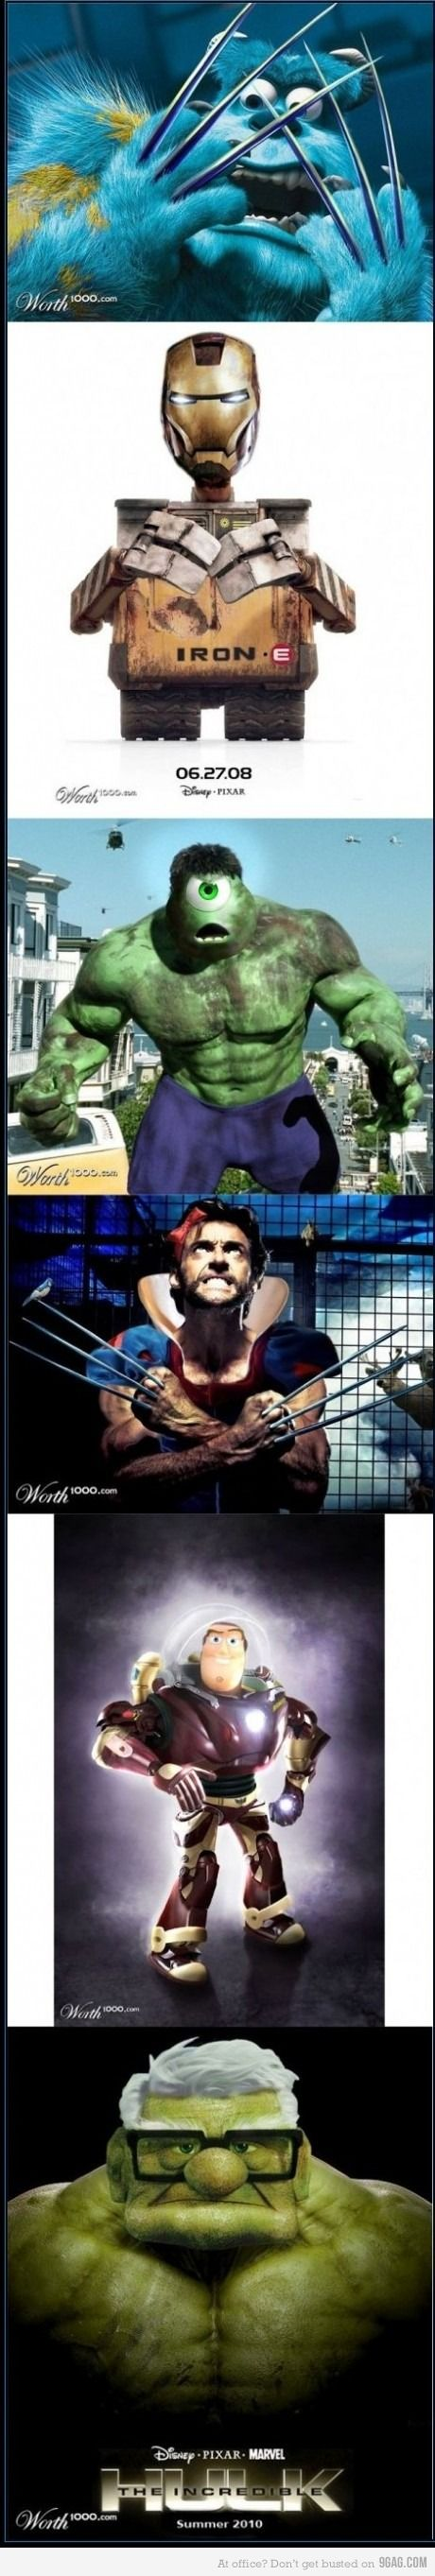 Disney + Marvel = excellent